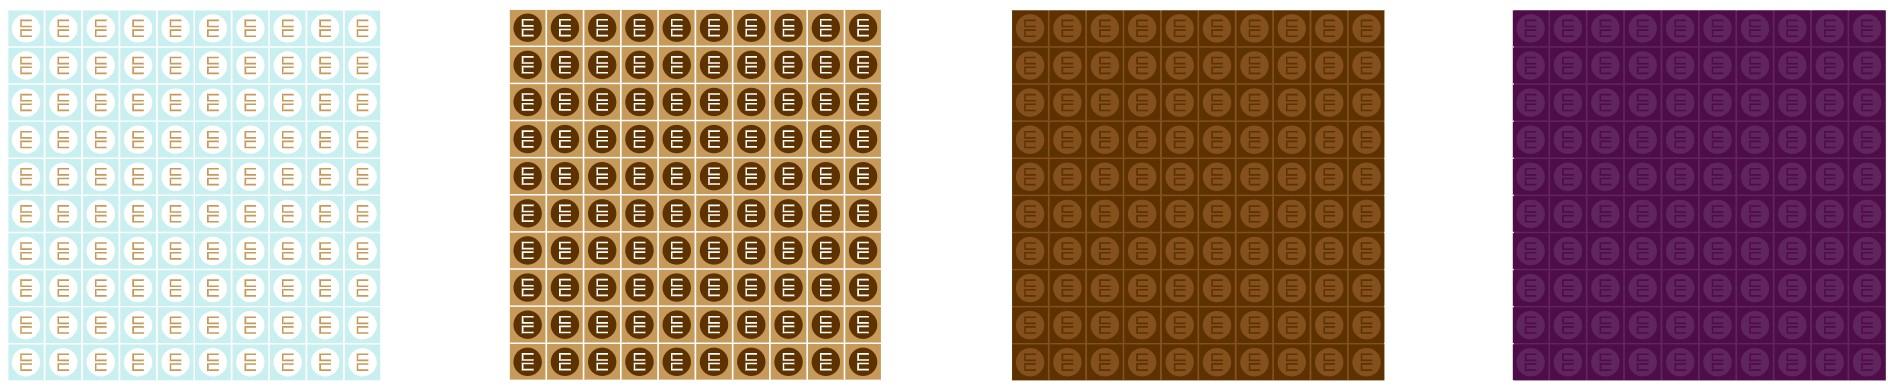 ekeberg-symbol-forsjellige